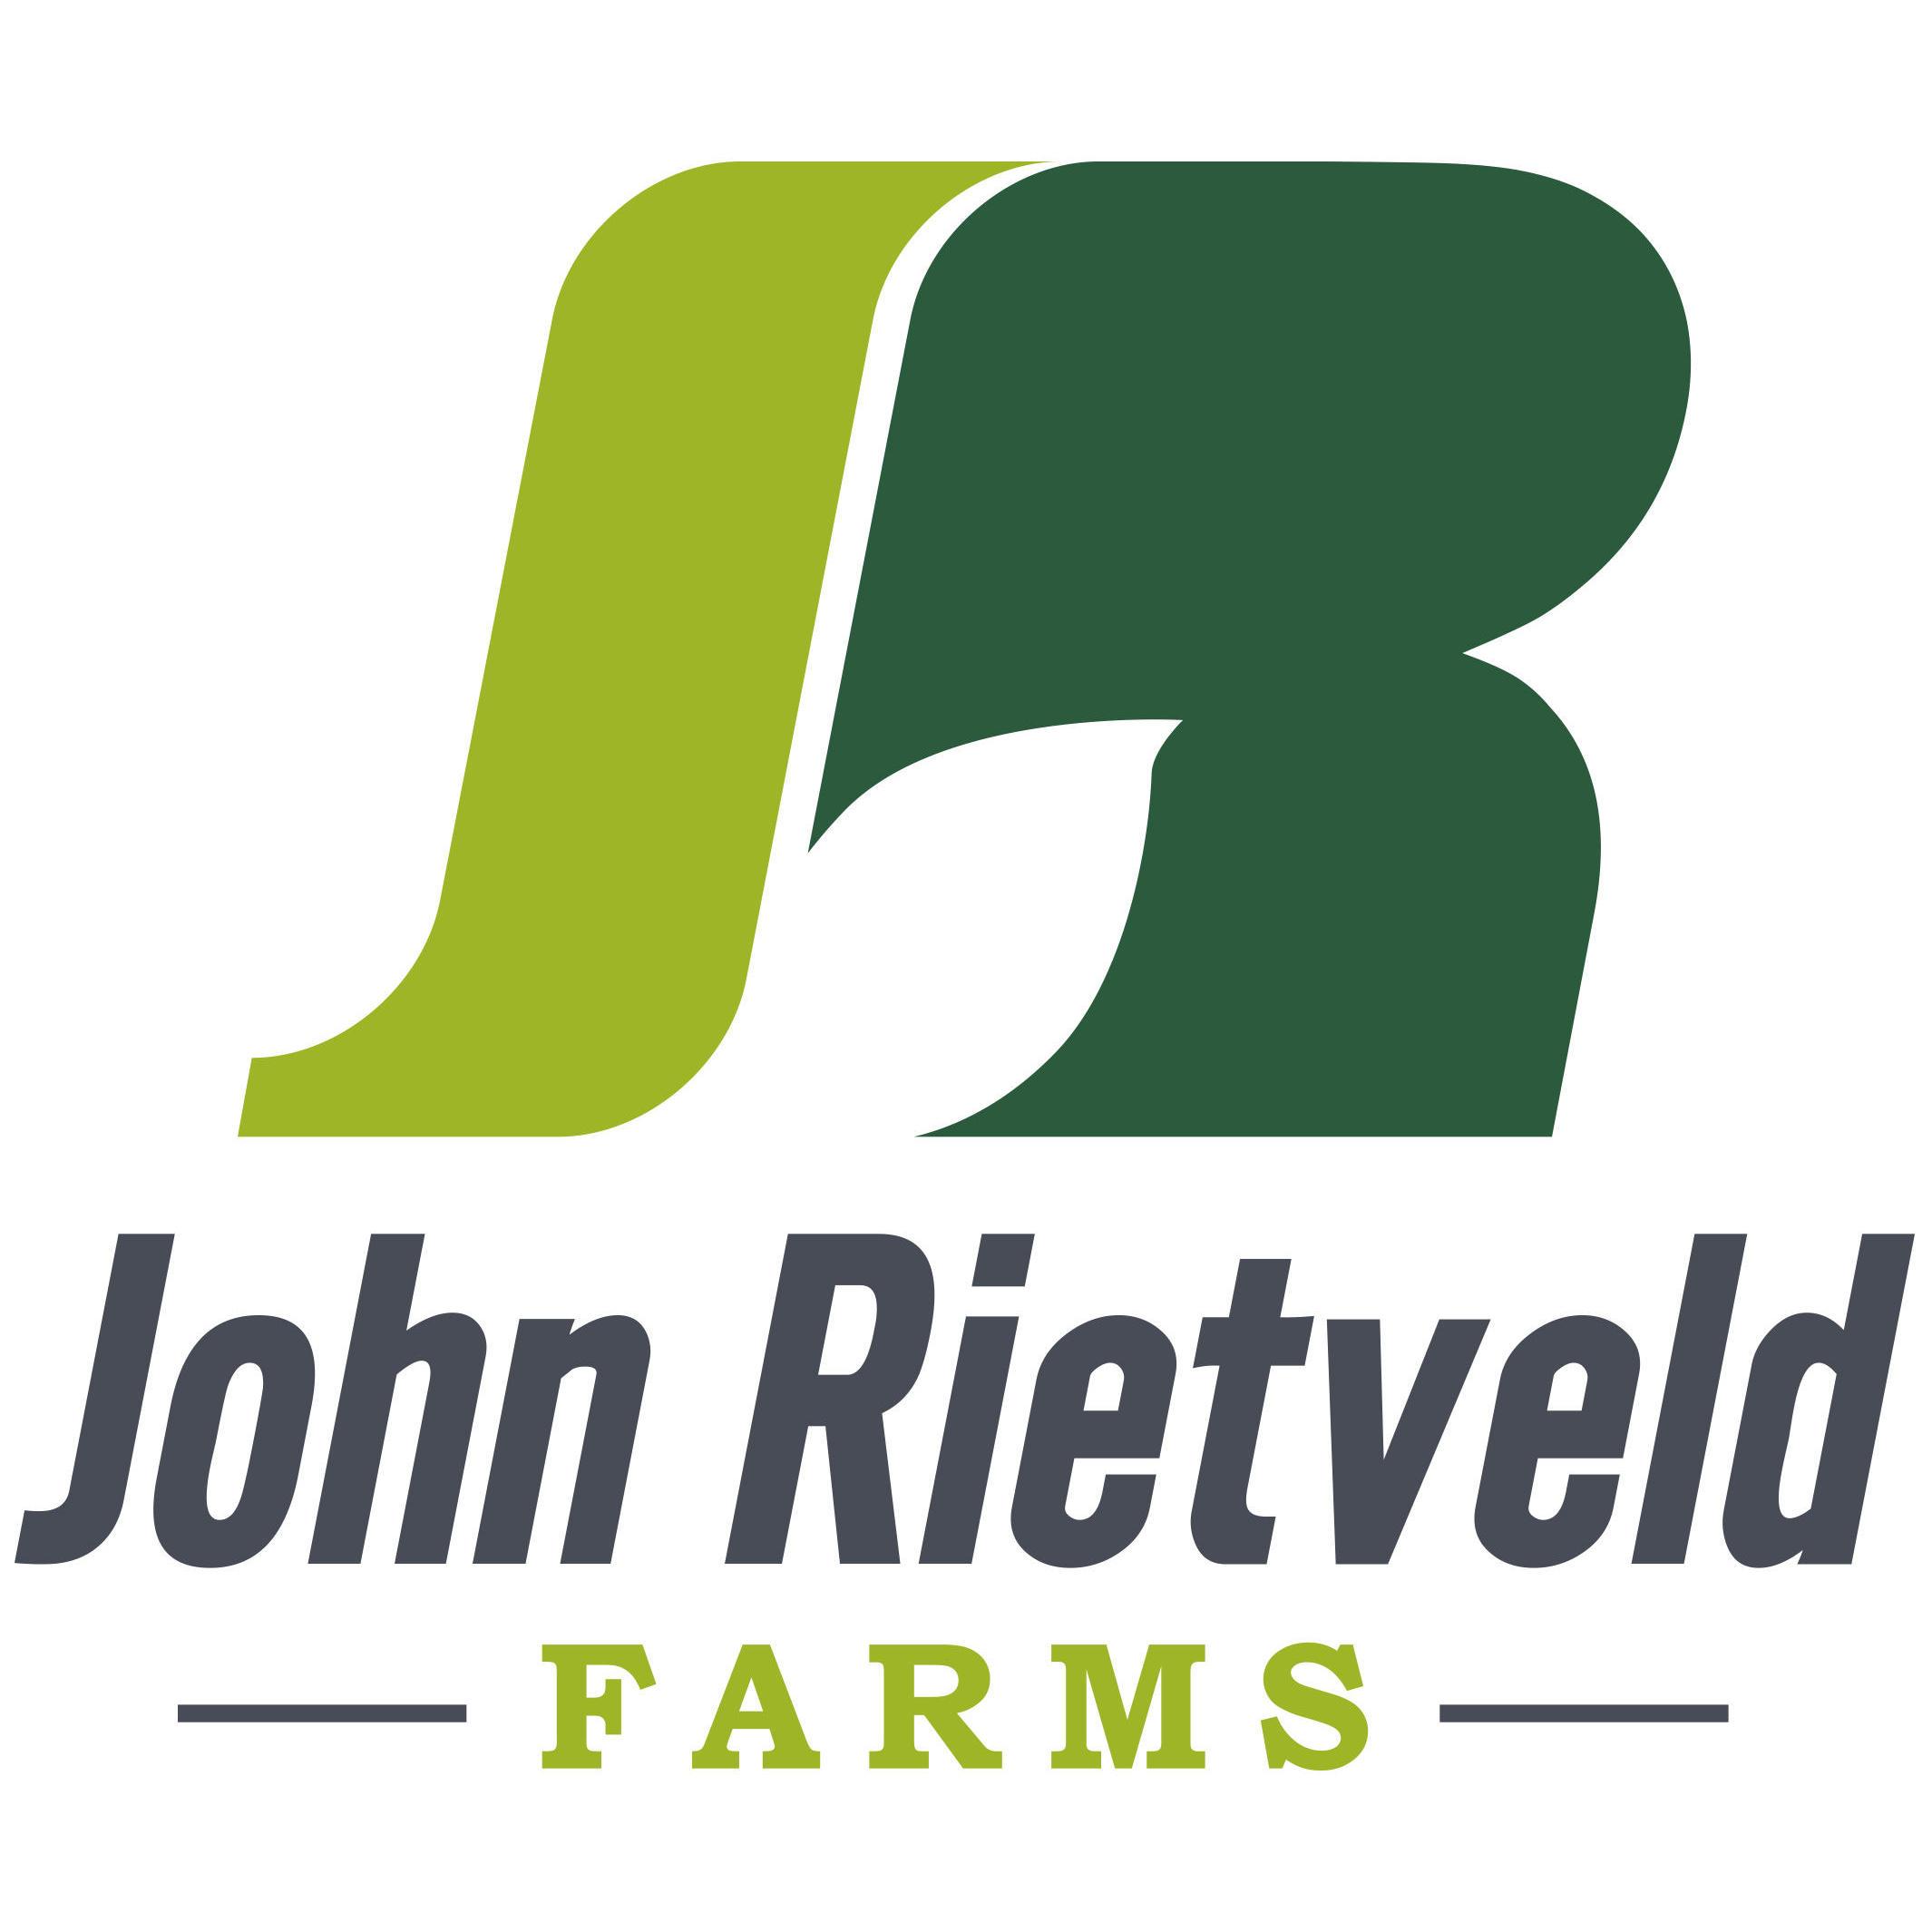 John Rietveld Farms, LLC